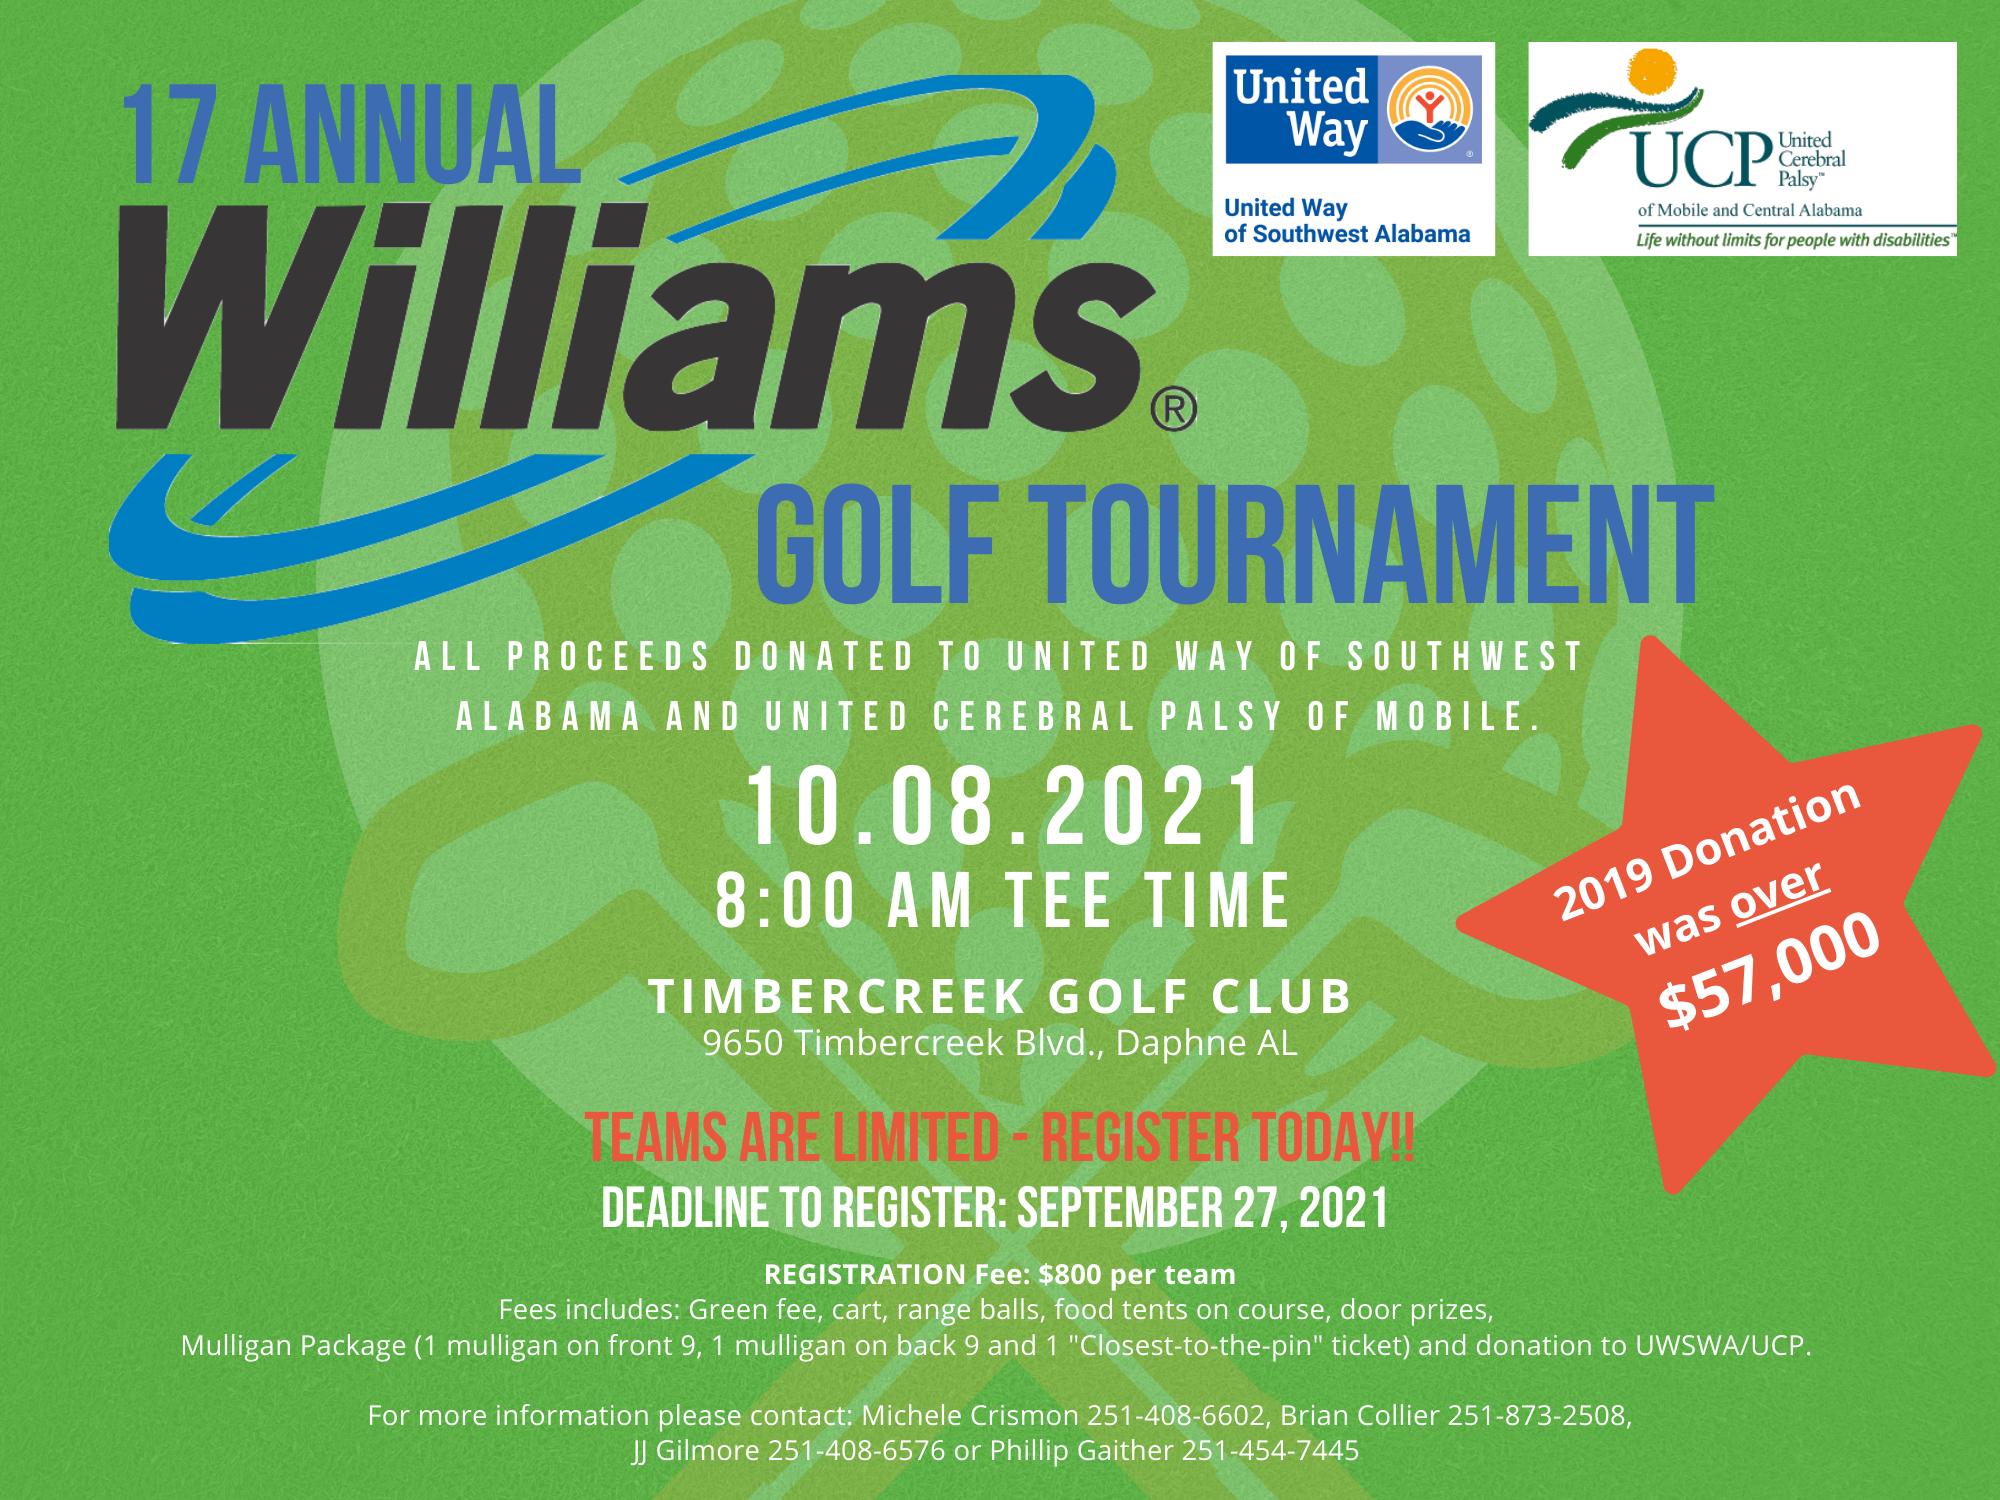 Williams 17th Annual Golf Tournament